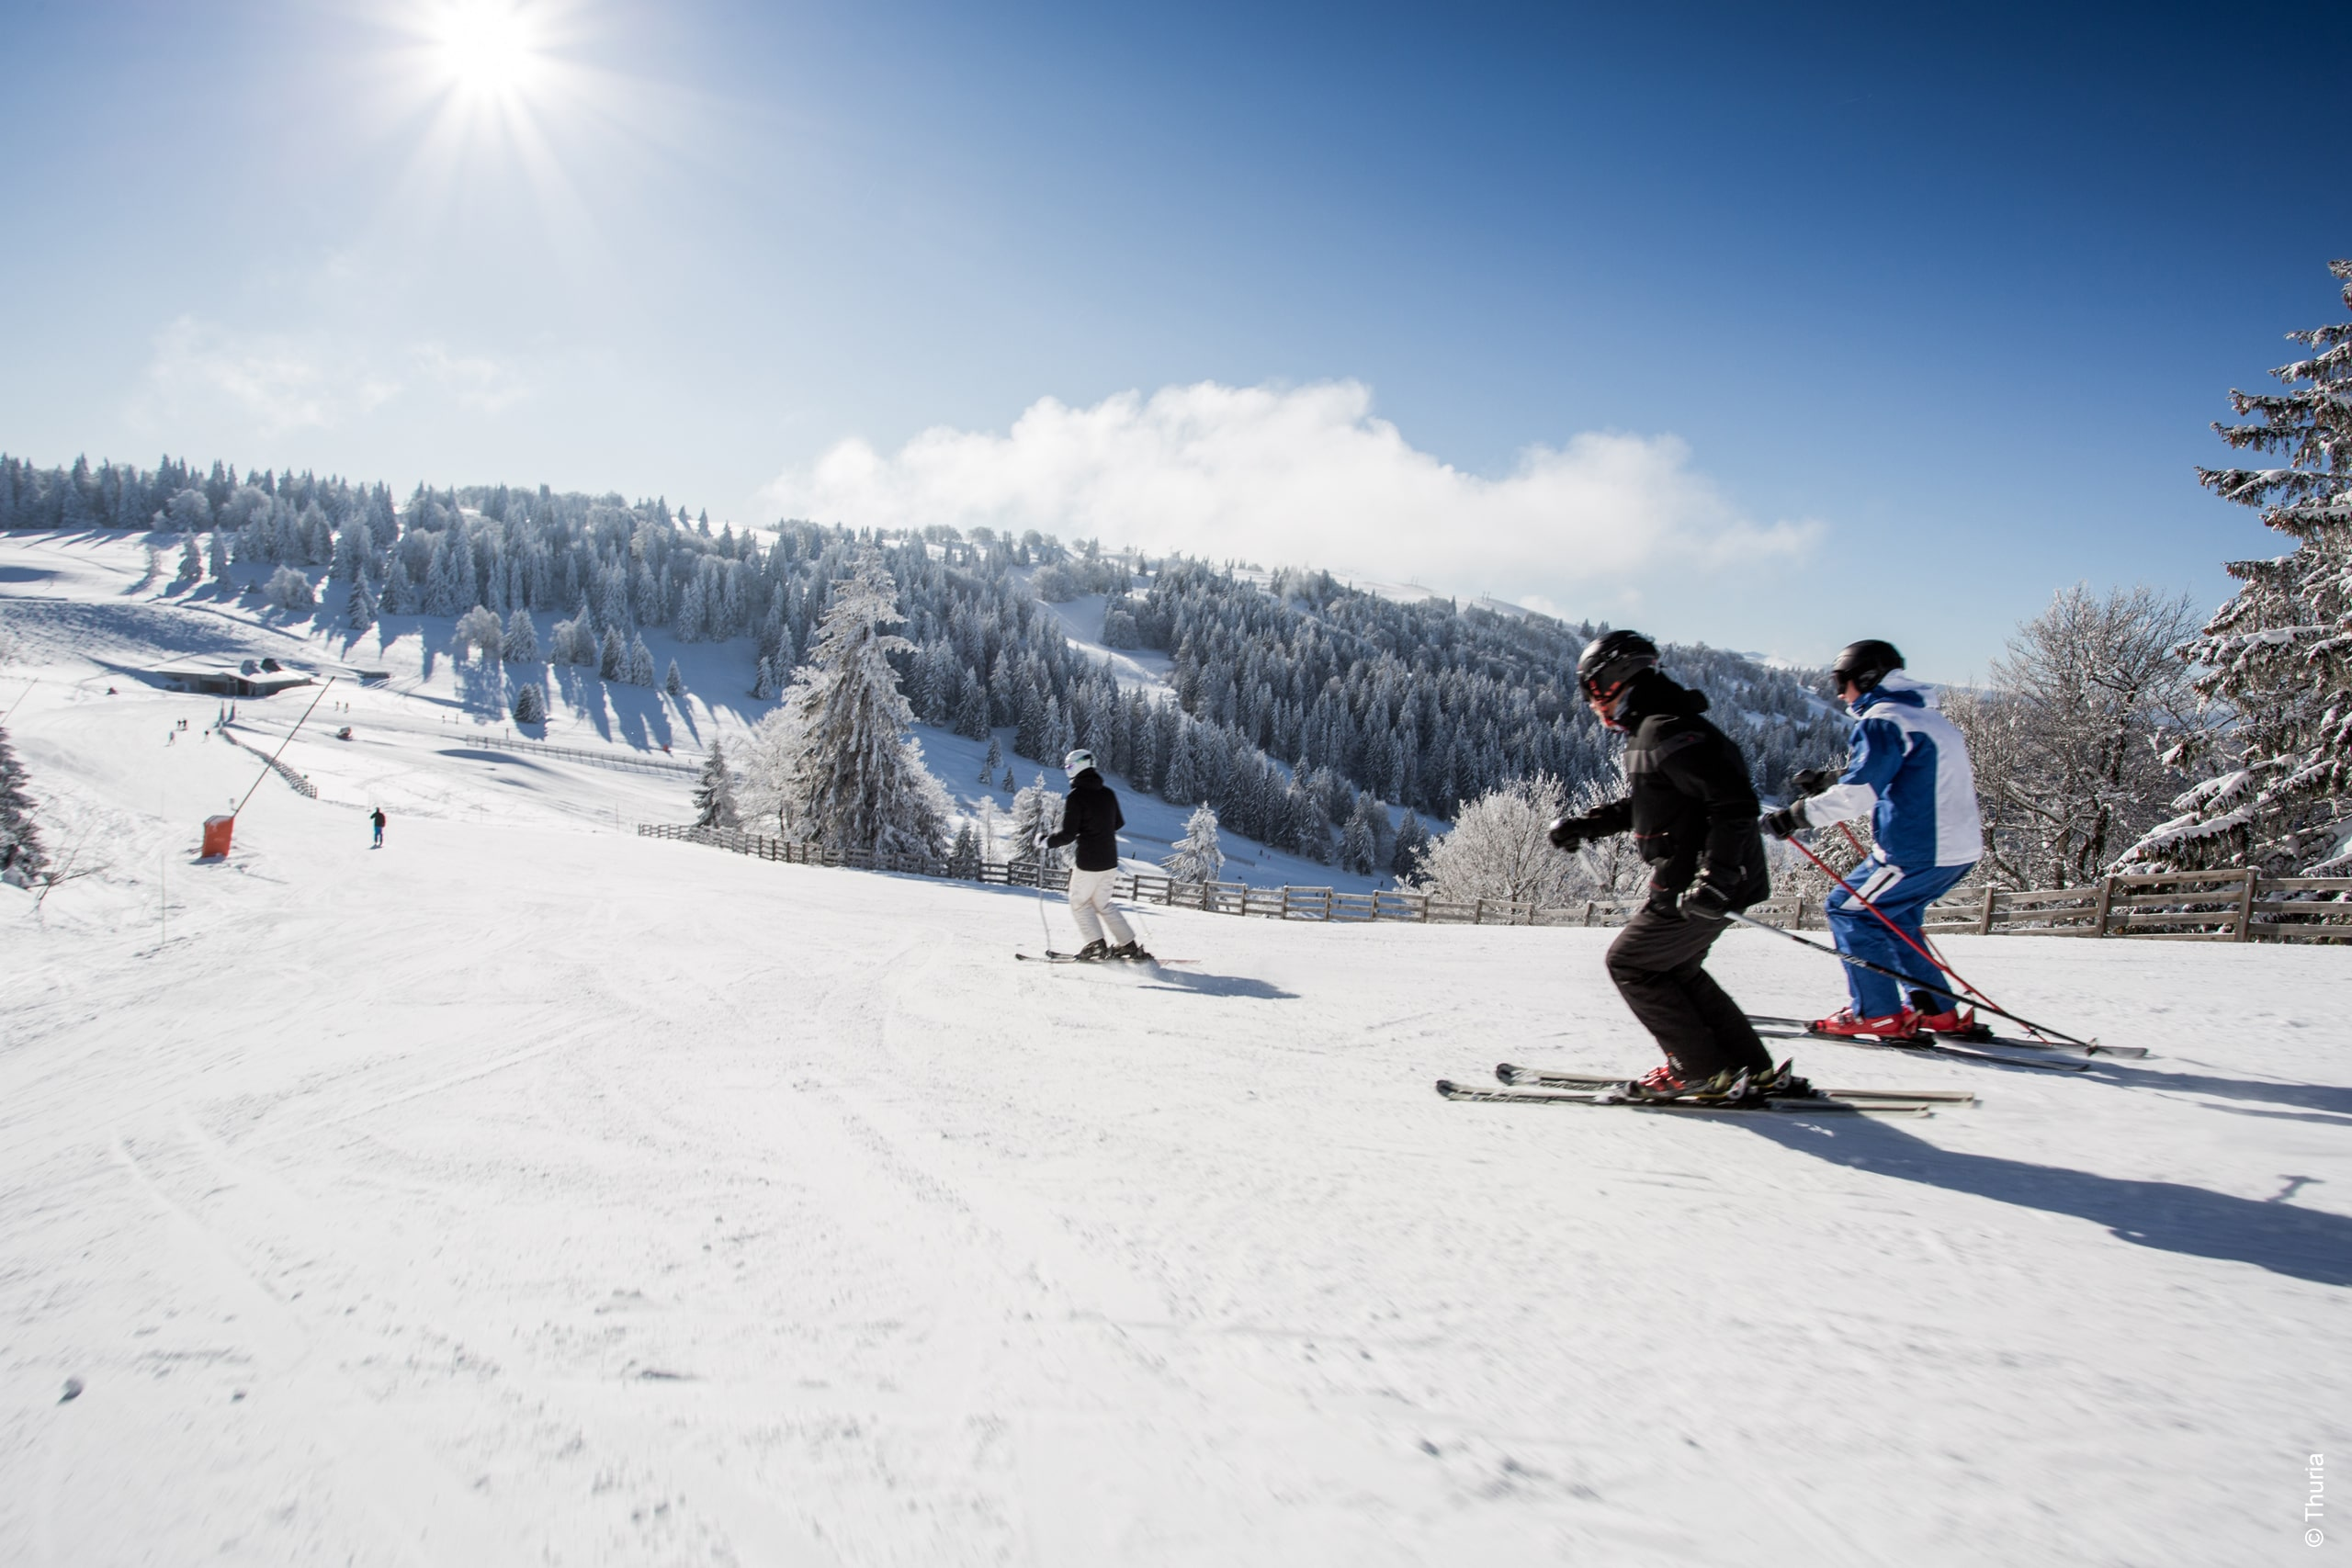 Metabief-vacances-ski-famille-montagne-jura-©Thuria-62.jpg